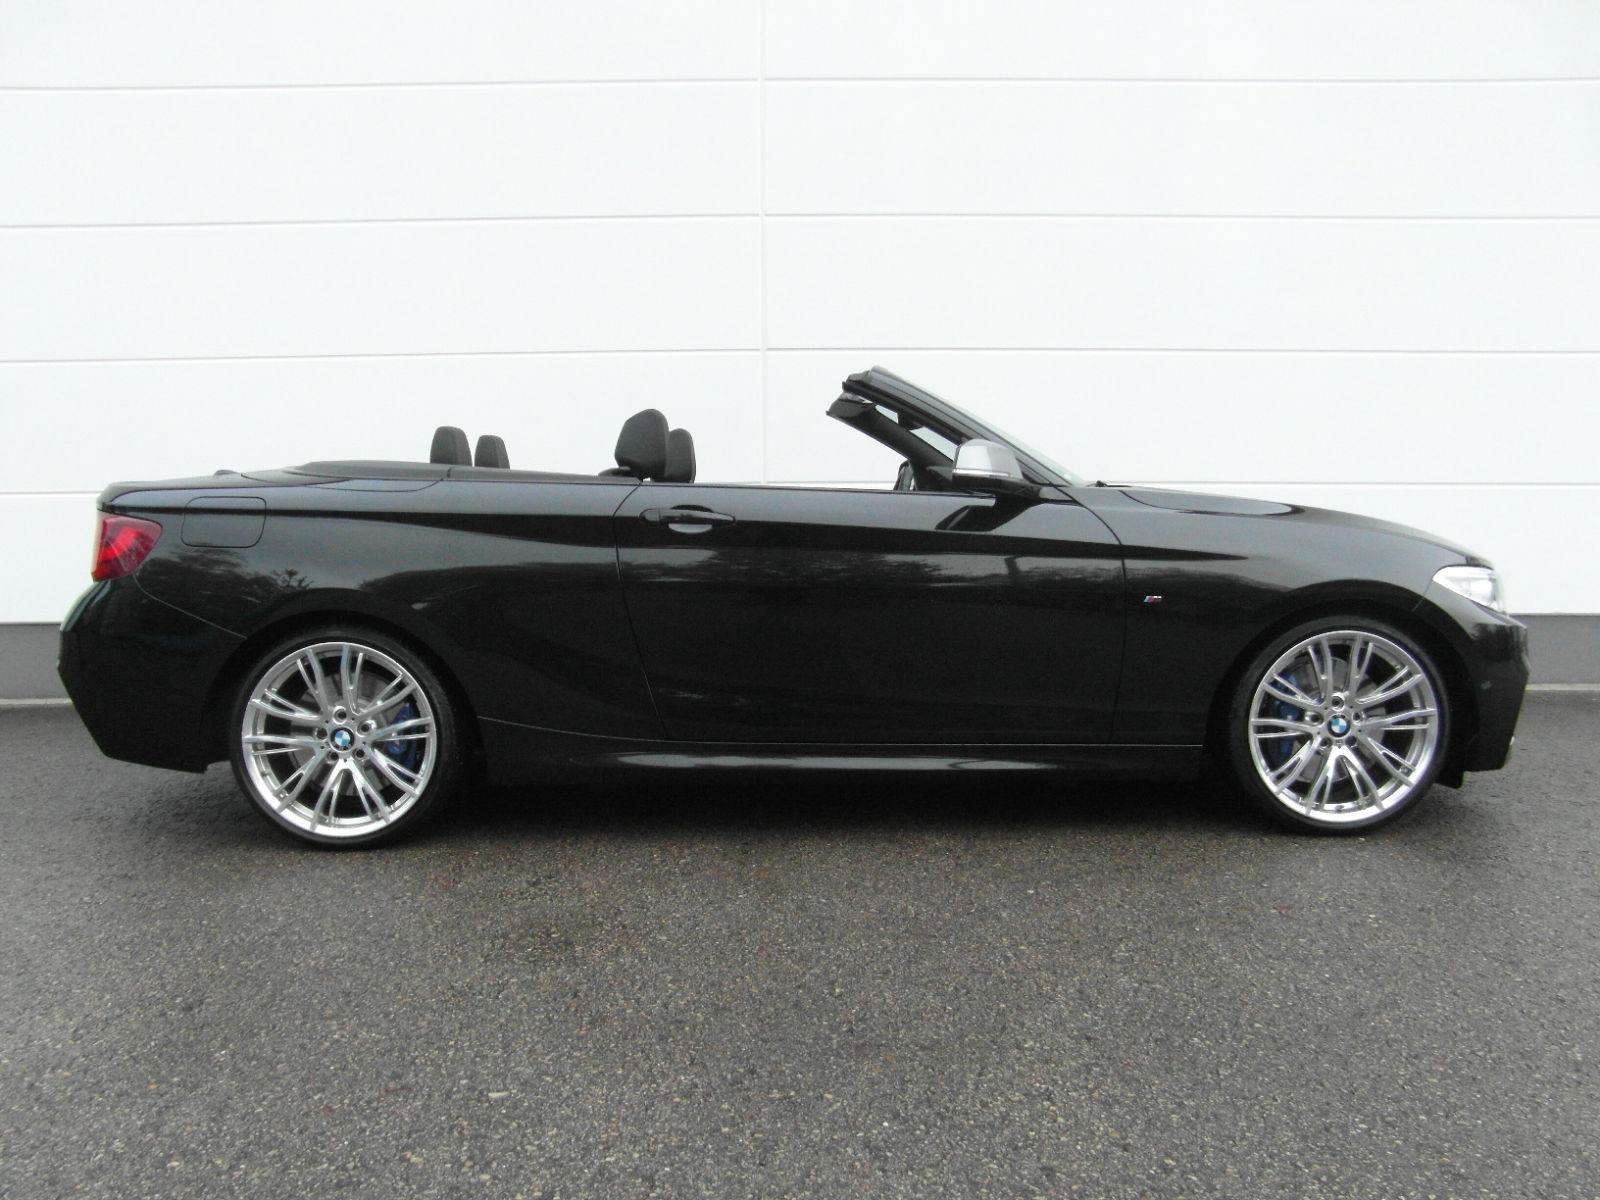 BMW Felge M624 Chrom.JPG